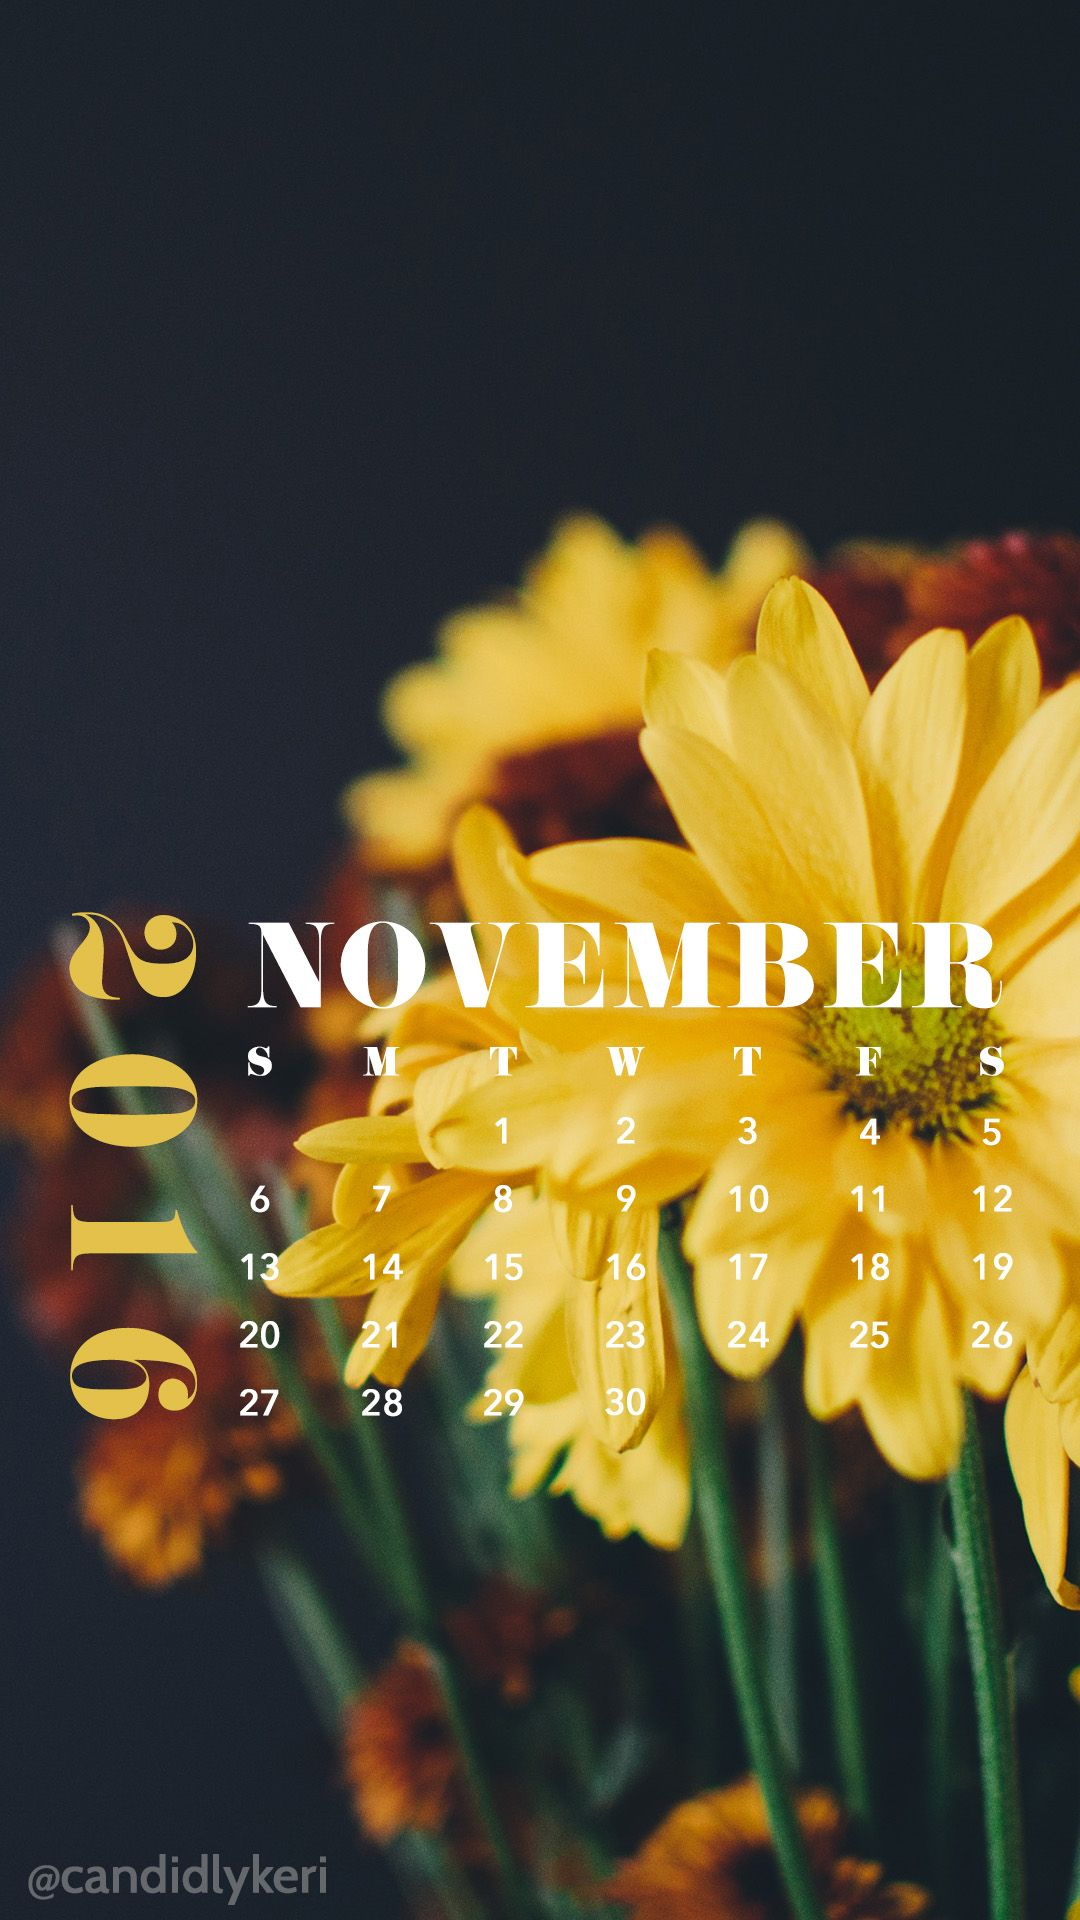 Pretty Yellow Flowers November Calendar 2016 Wallpaper You Can